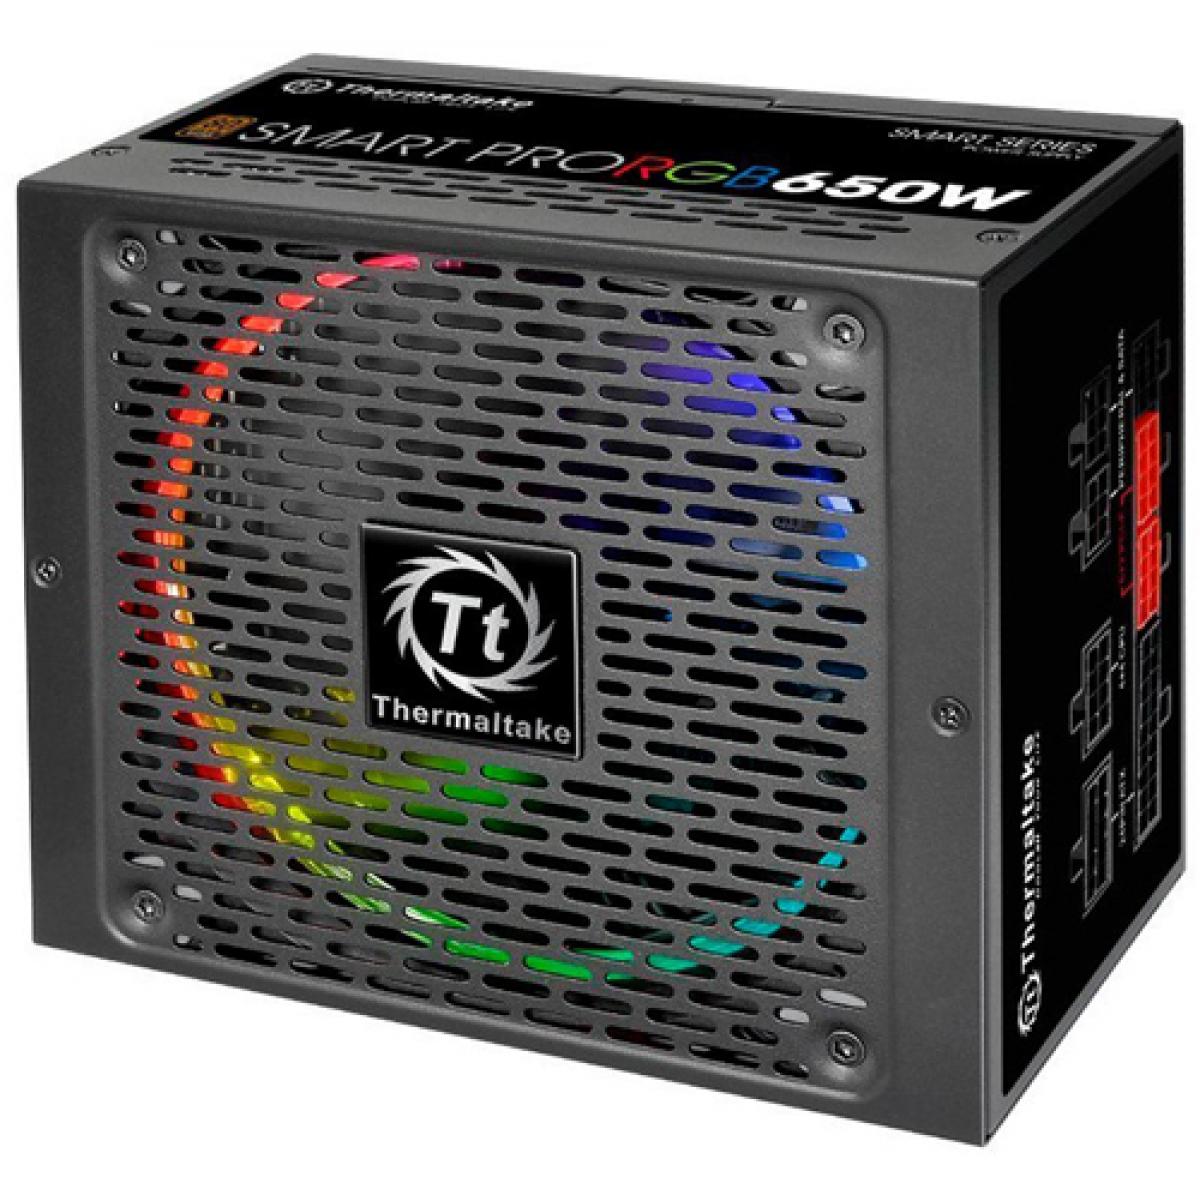 Fonte Thermaltake Smart Pro RGB 650W, 80 Plus Bronze, PFC Ativo, Full Modular, PS-SPR-0650FPCBBZ-R